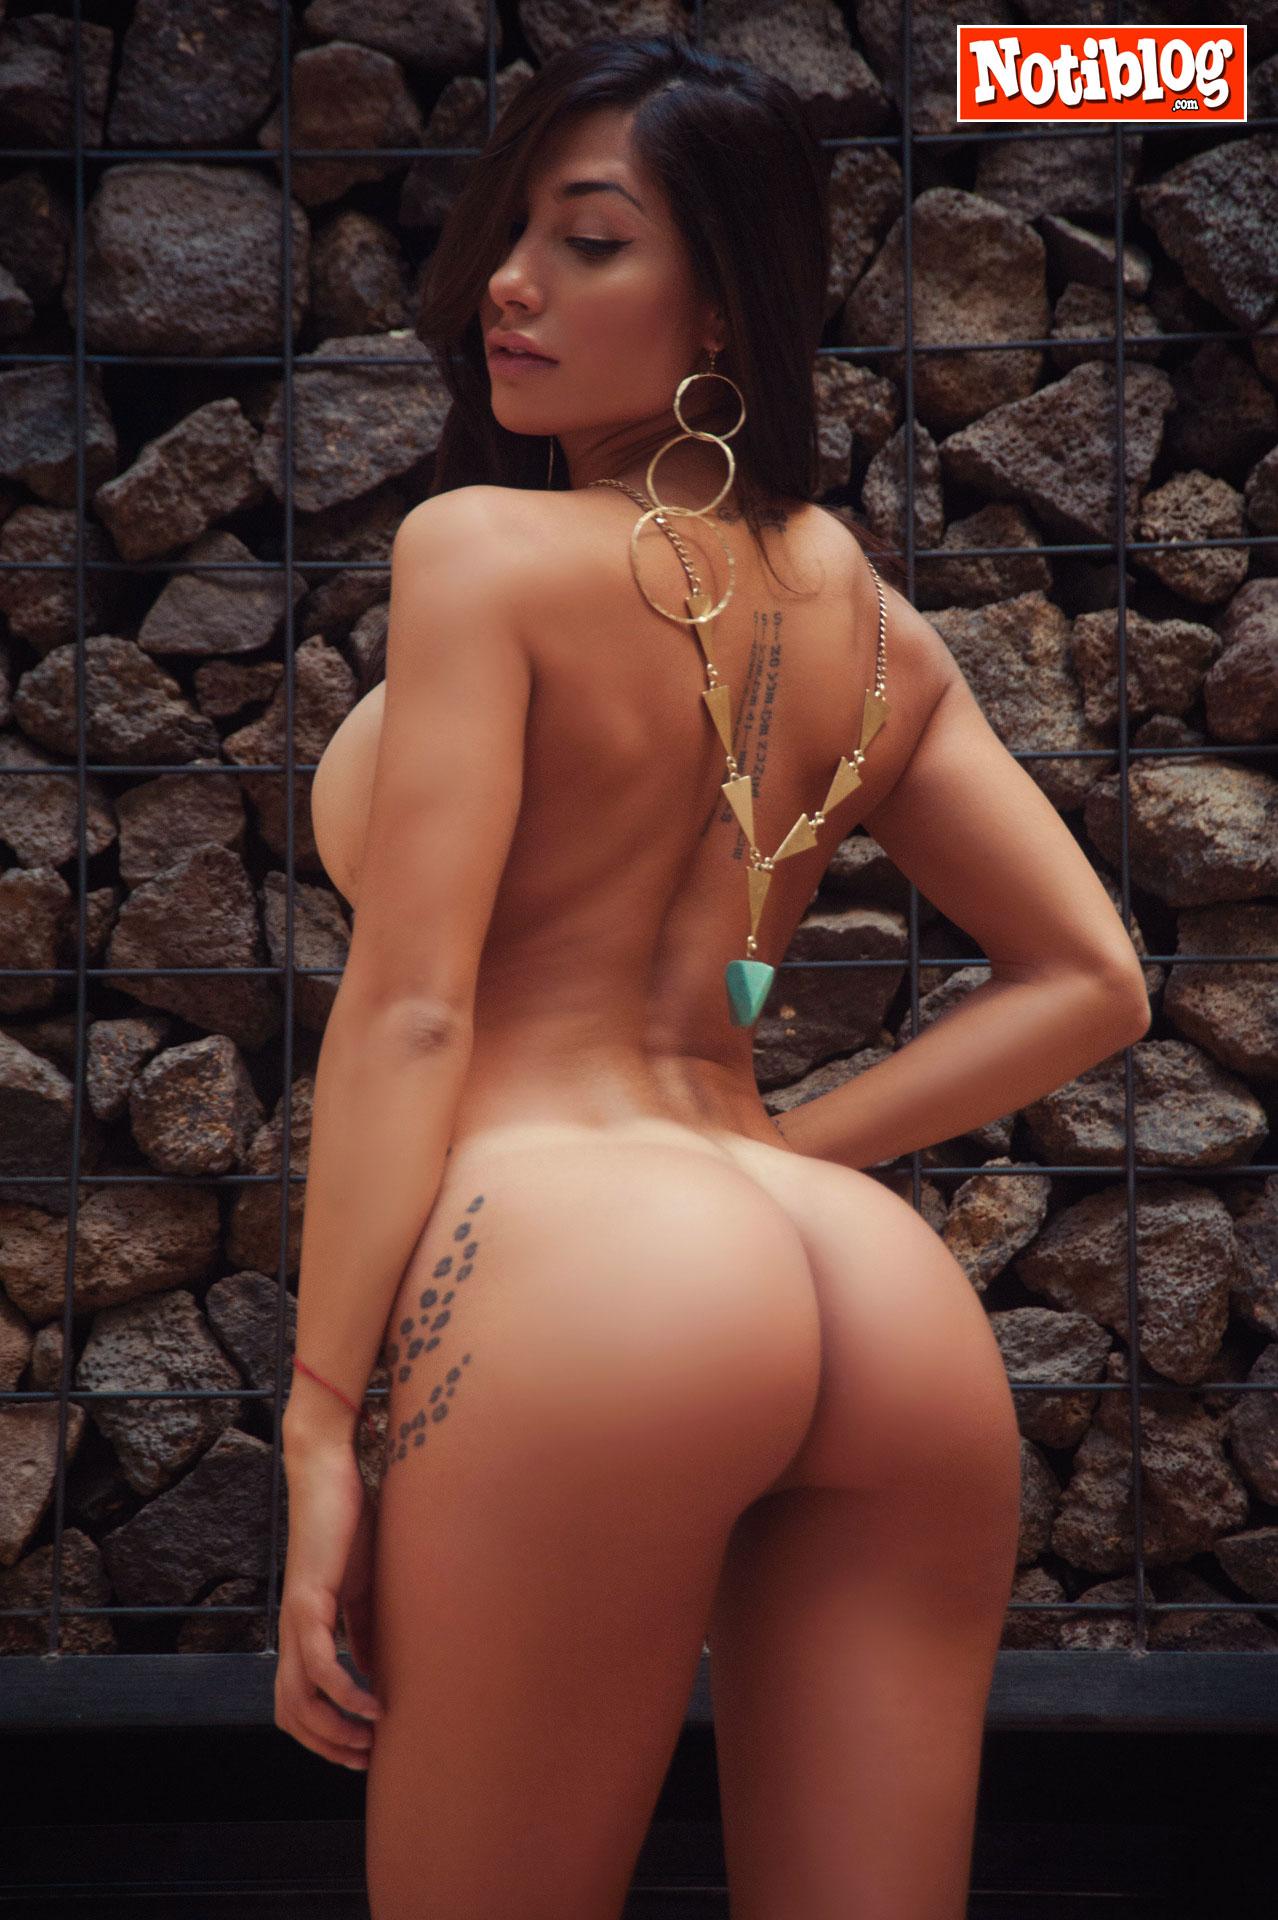 Argentinas Porno Famosas las famosas argentinas mas sexy s parte notiblog poringa